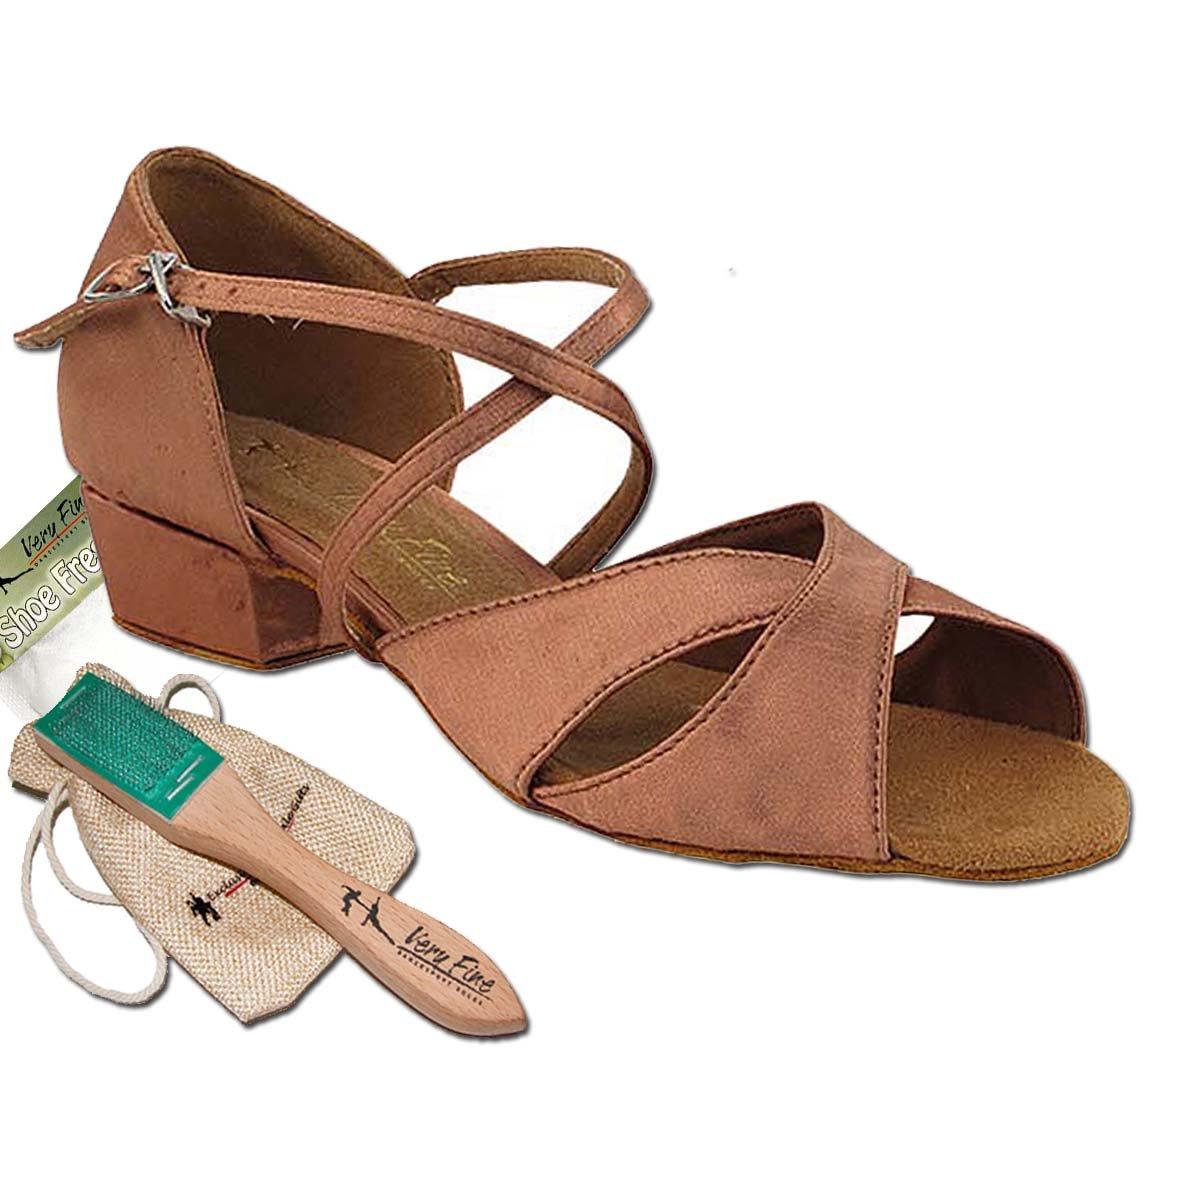 [Very Fine Dance Shoes] レディース B0728P68Y8 タン サテン 6.5 (B,M) US